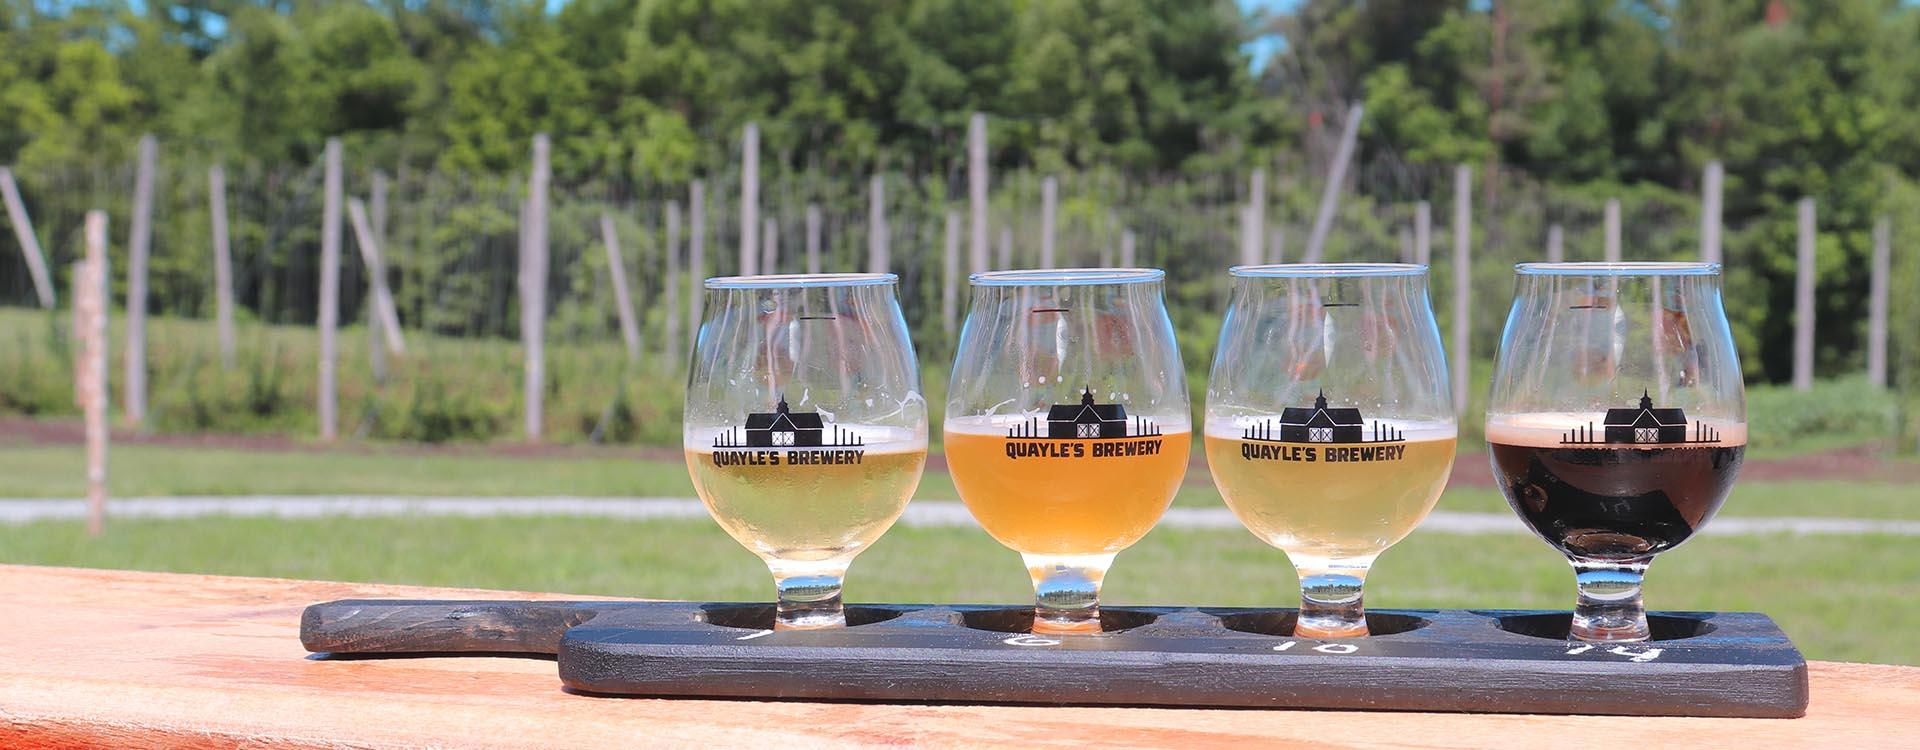 Quayles Brewery 1 - Tourism Spotlight: Quayle's Brewery